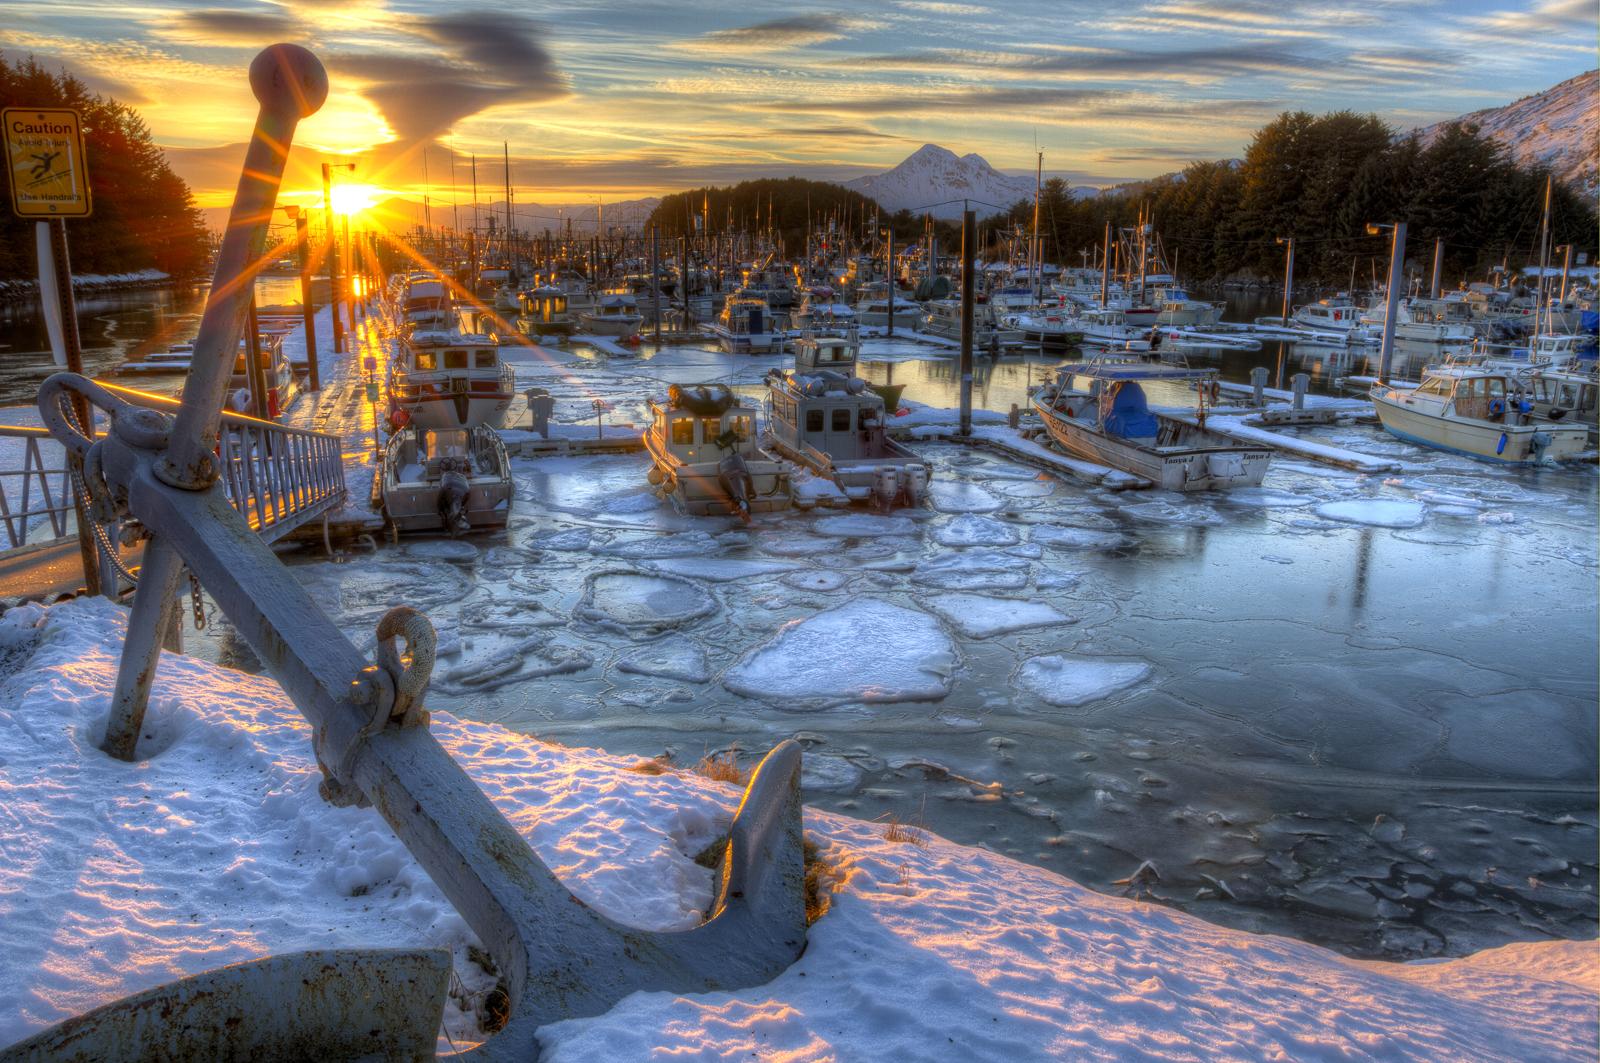 Winter, ice, water, anchor, Kodiak, Alaska